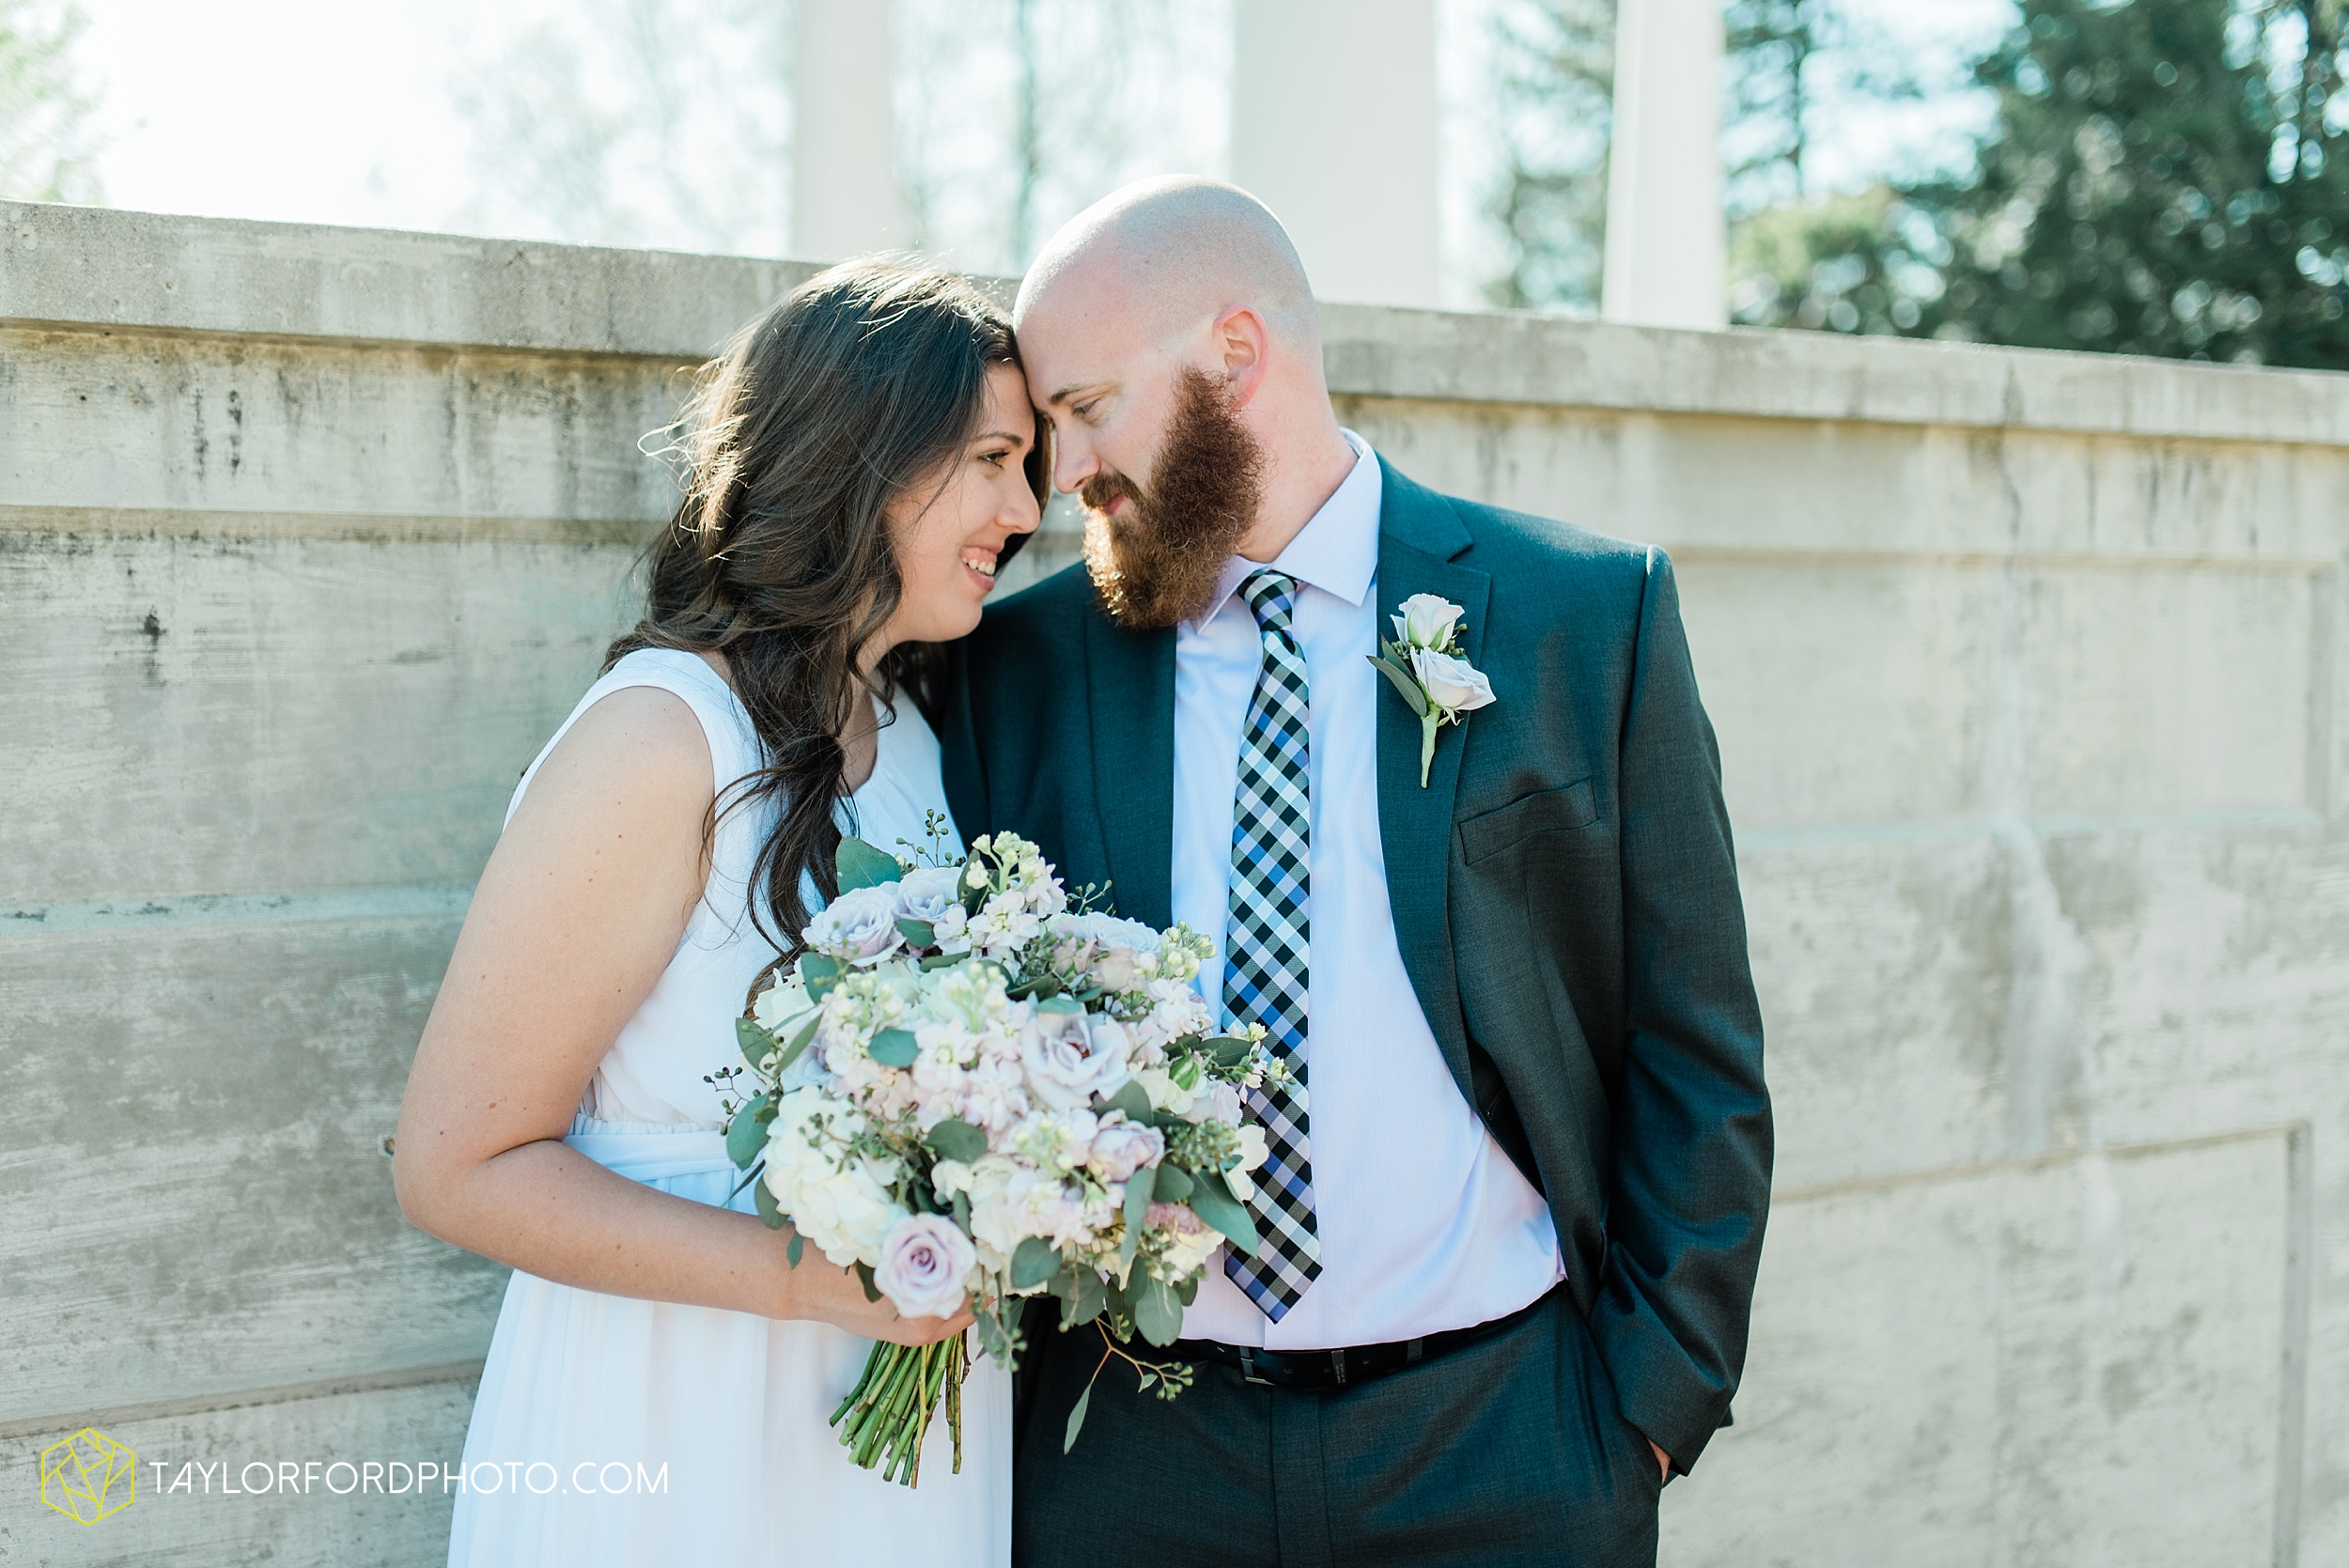 lakeside-rose-gardens-fort-wayne-indiana-elopement-wedding-photographer-Taylor-Ford-Photography_7162.jpg